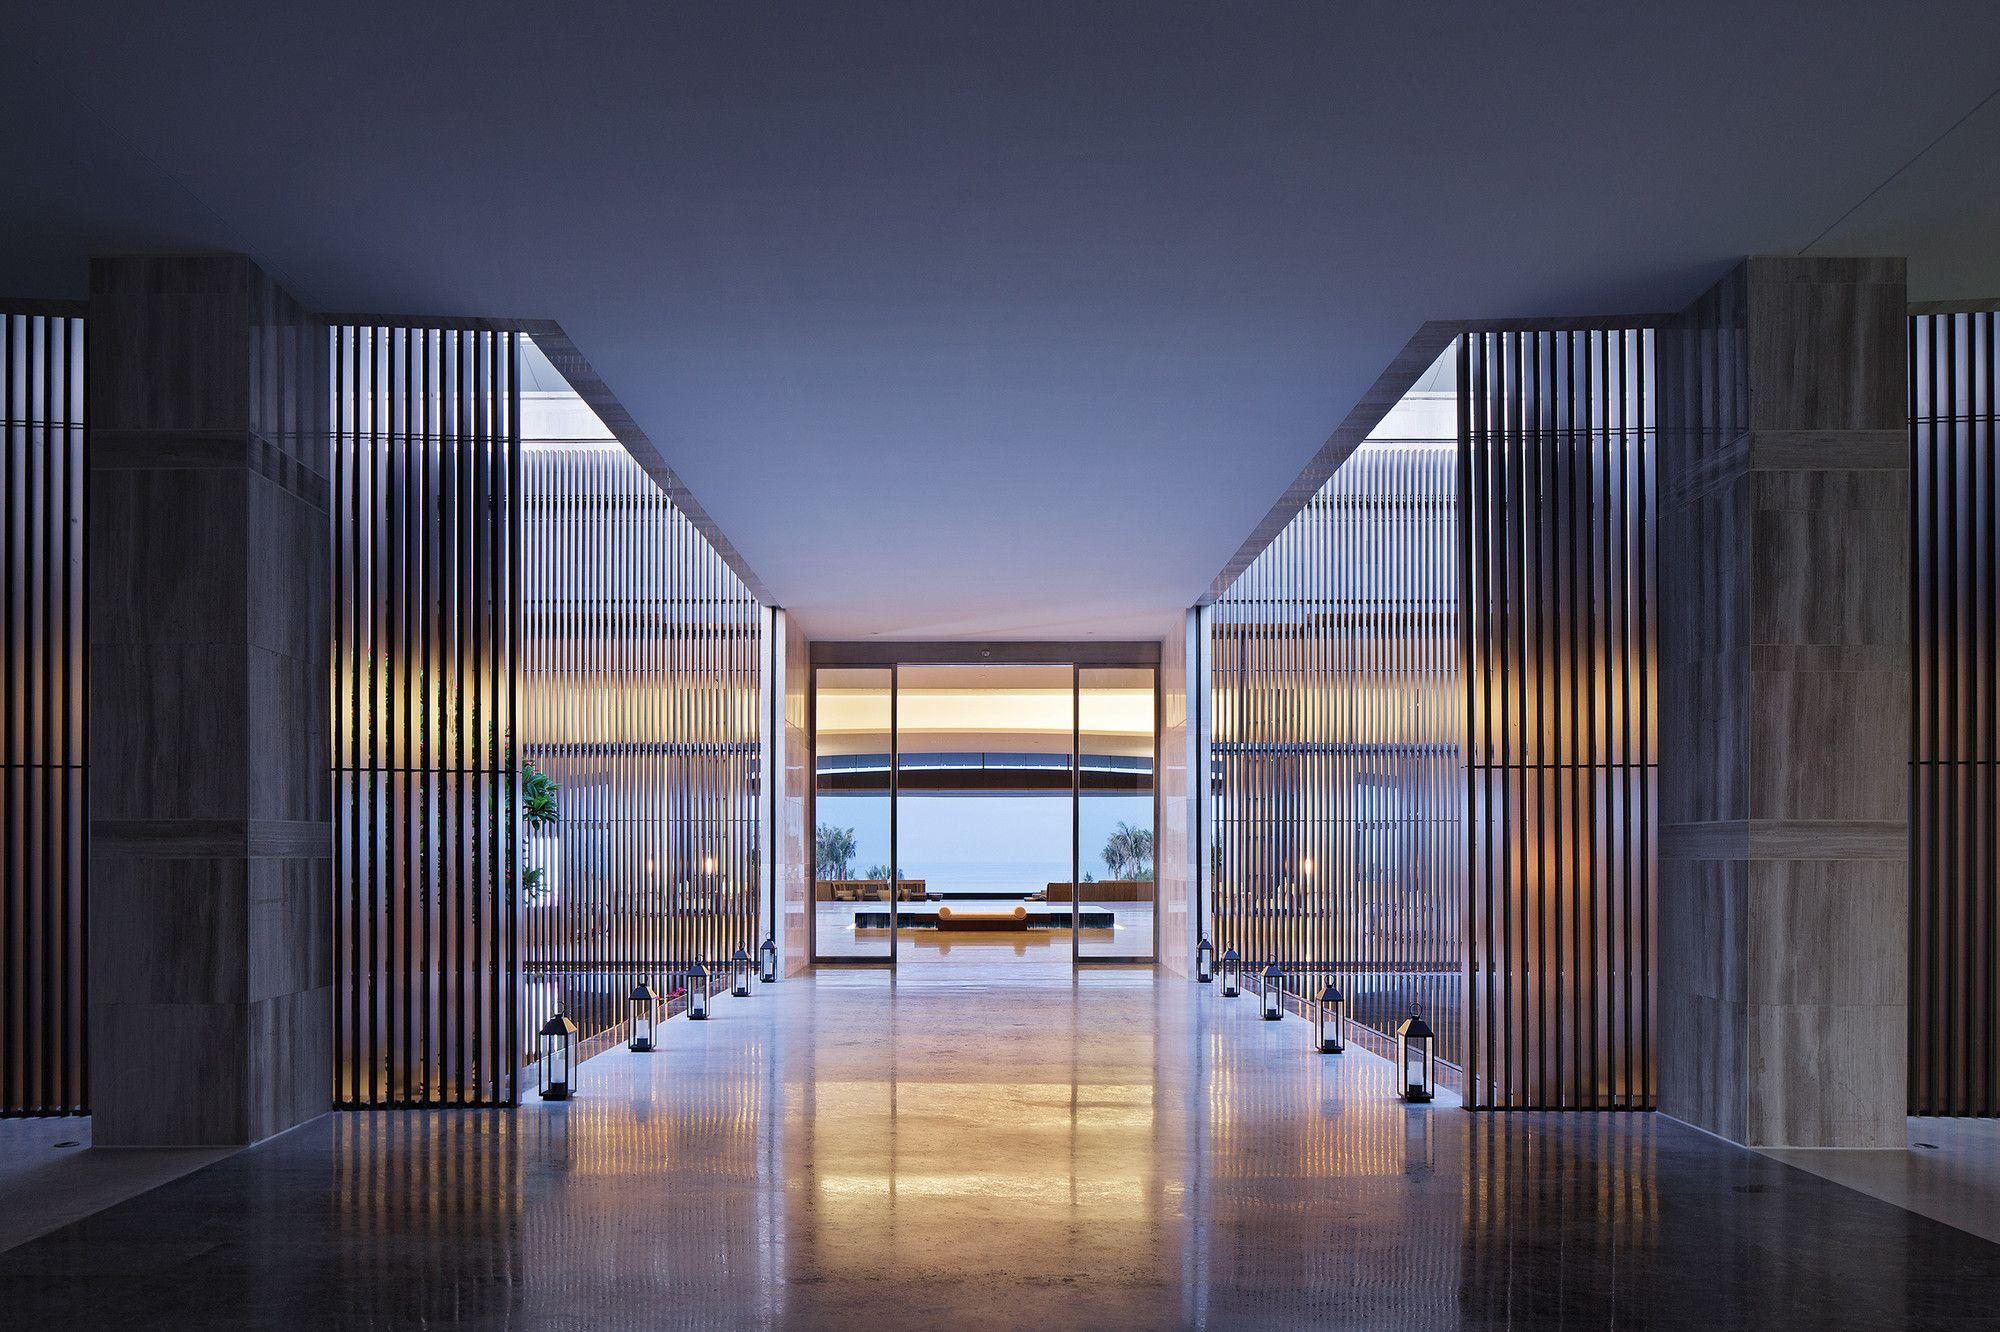 gallery of hainan blue bay westin resort hotel / gad - 3 | lobbies